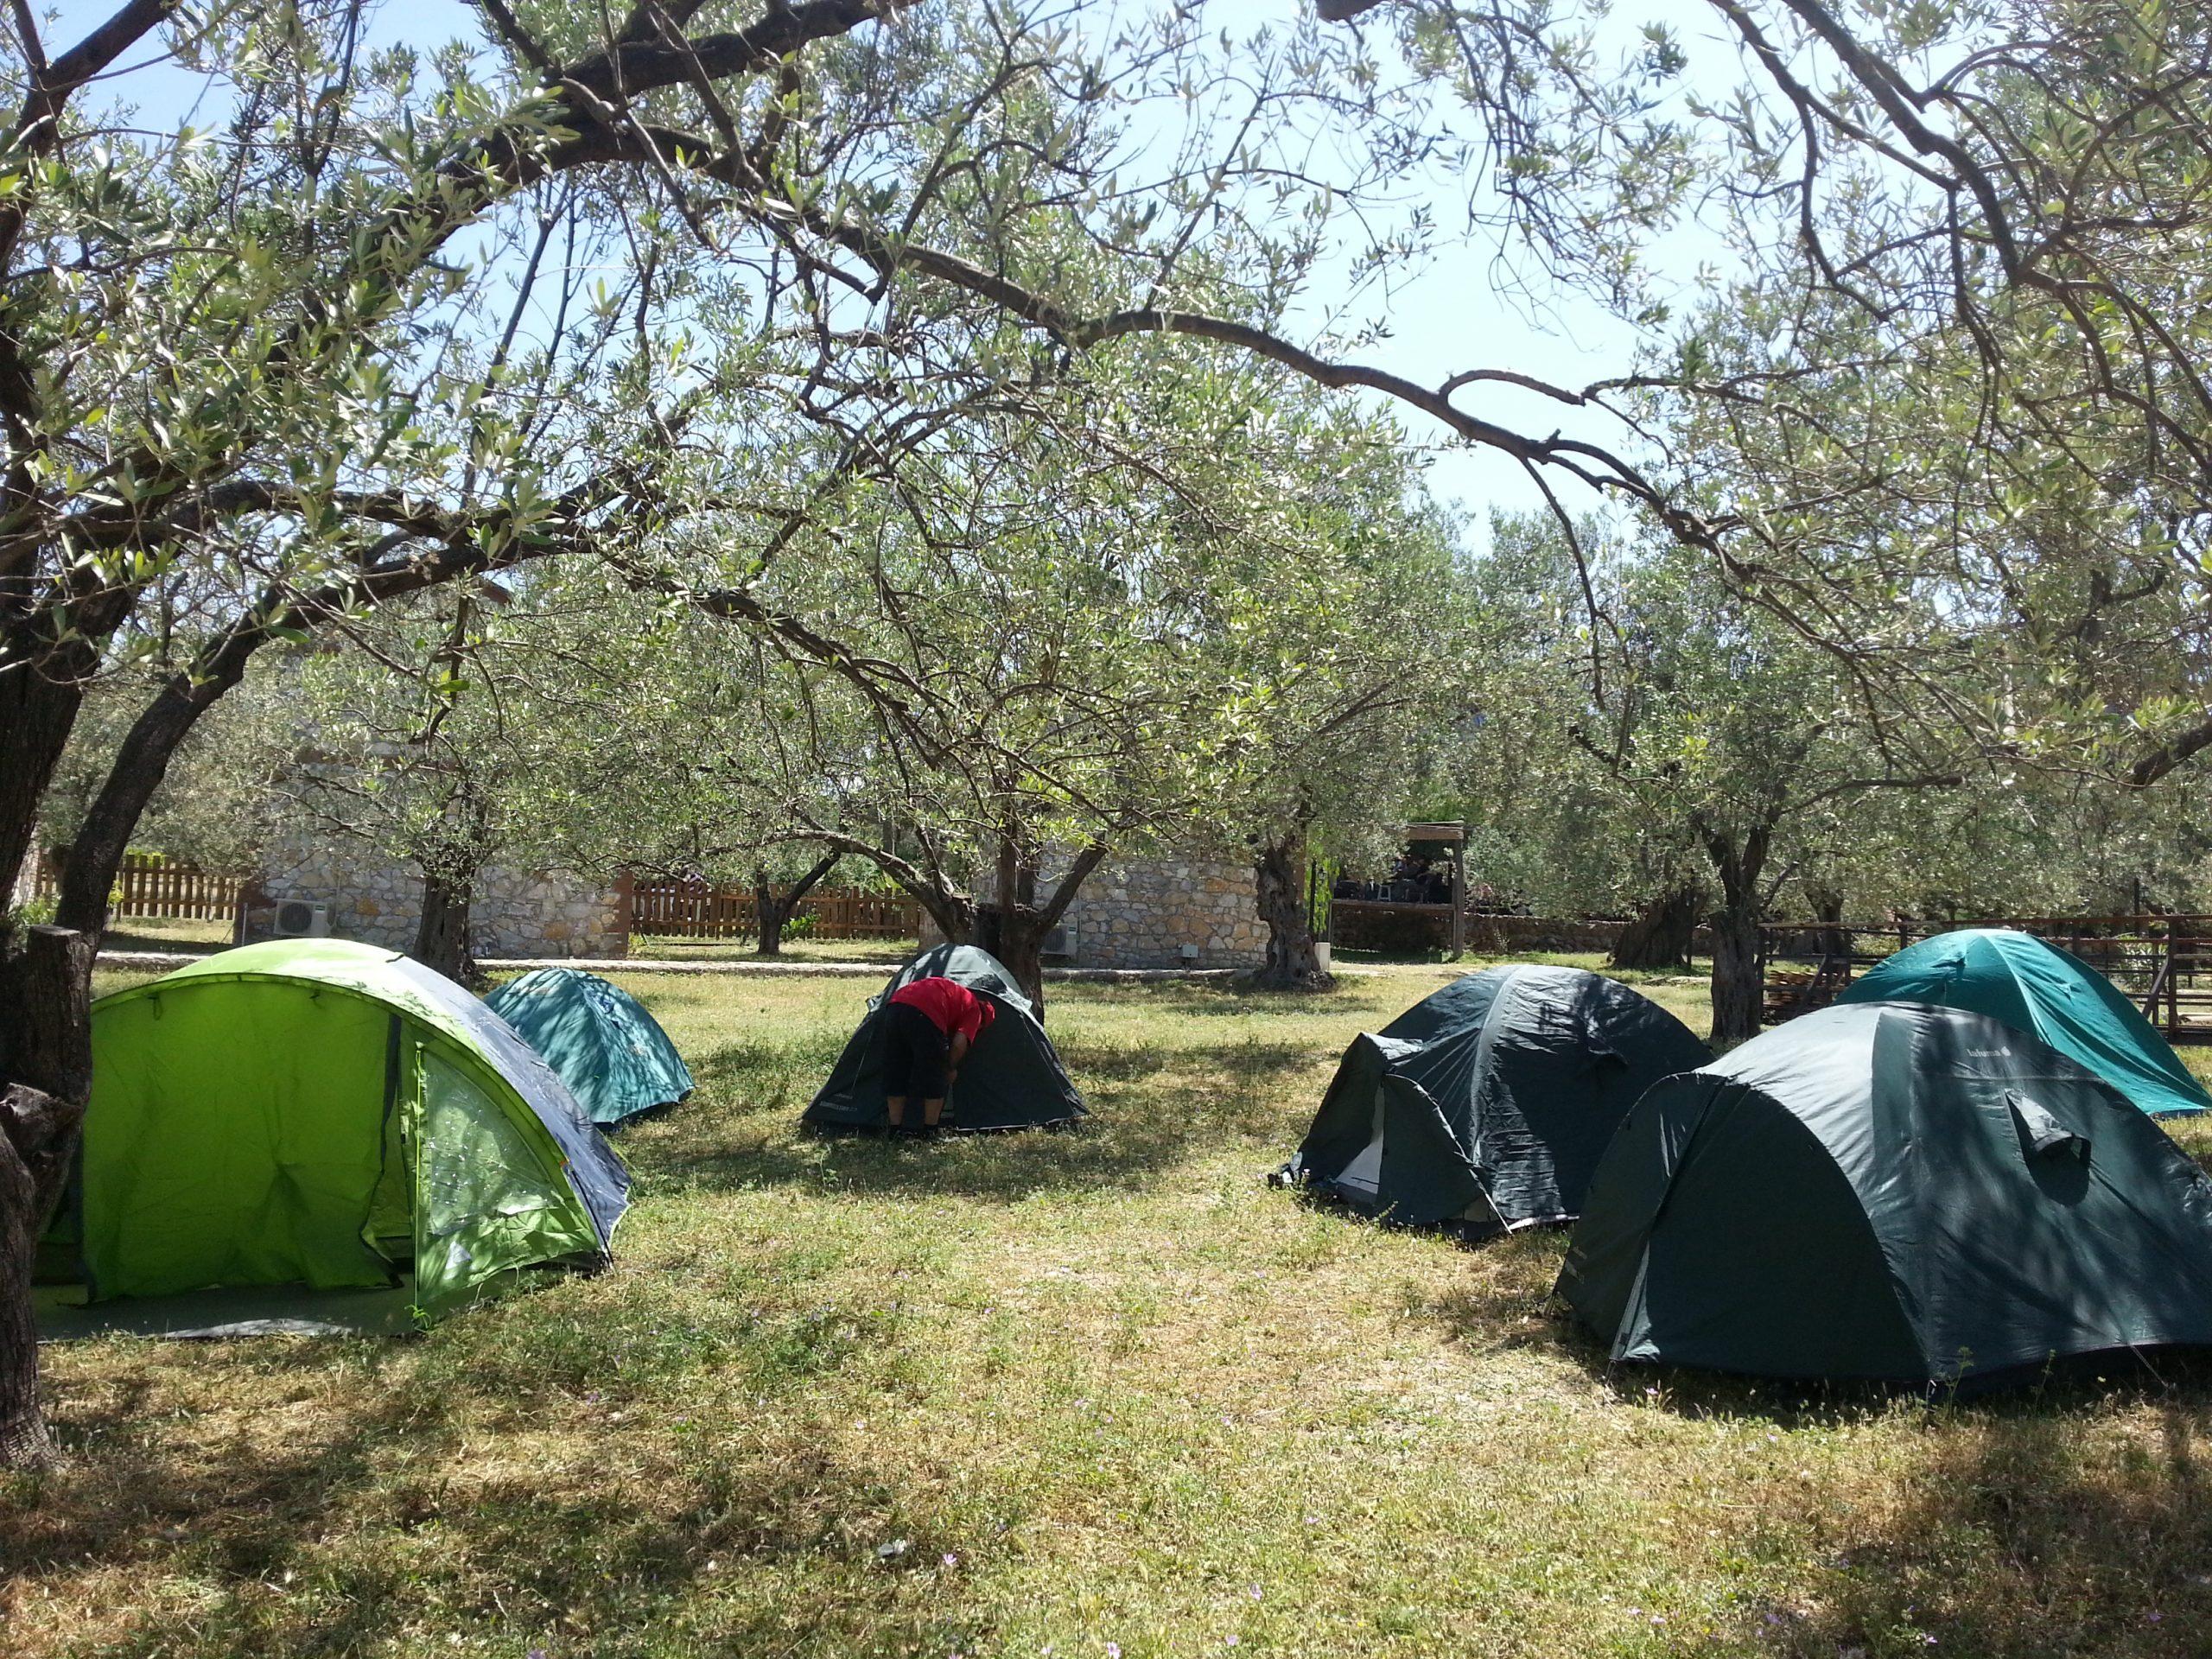 Ayvalık Kamp Mutlu Köy